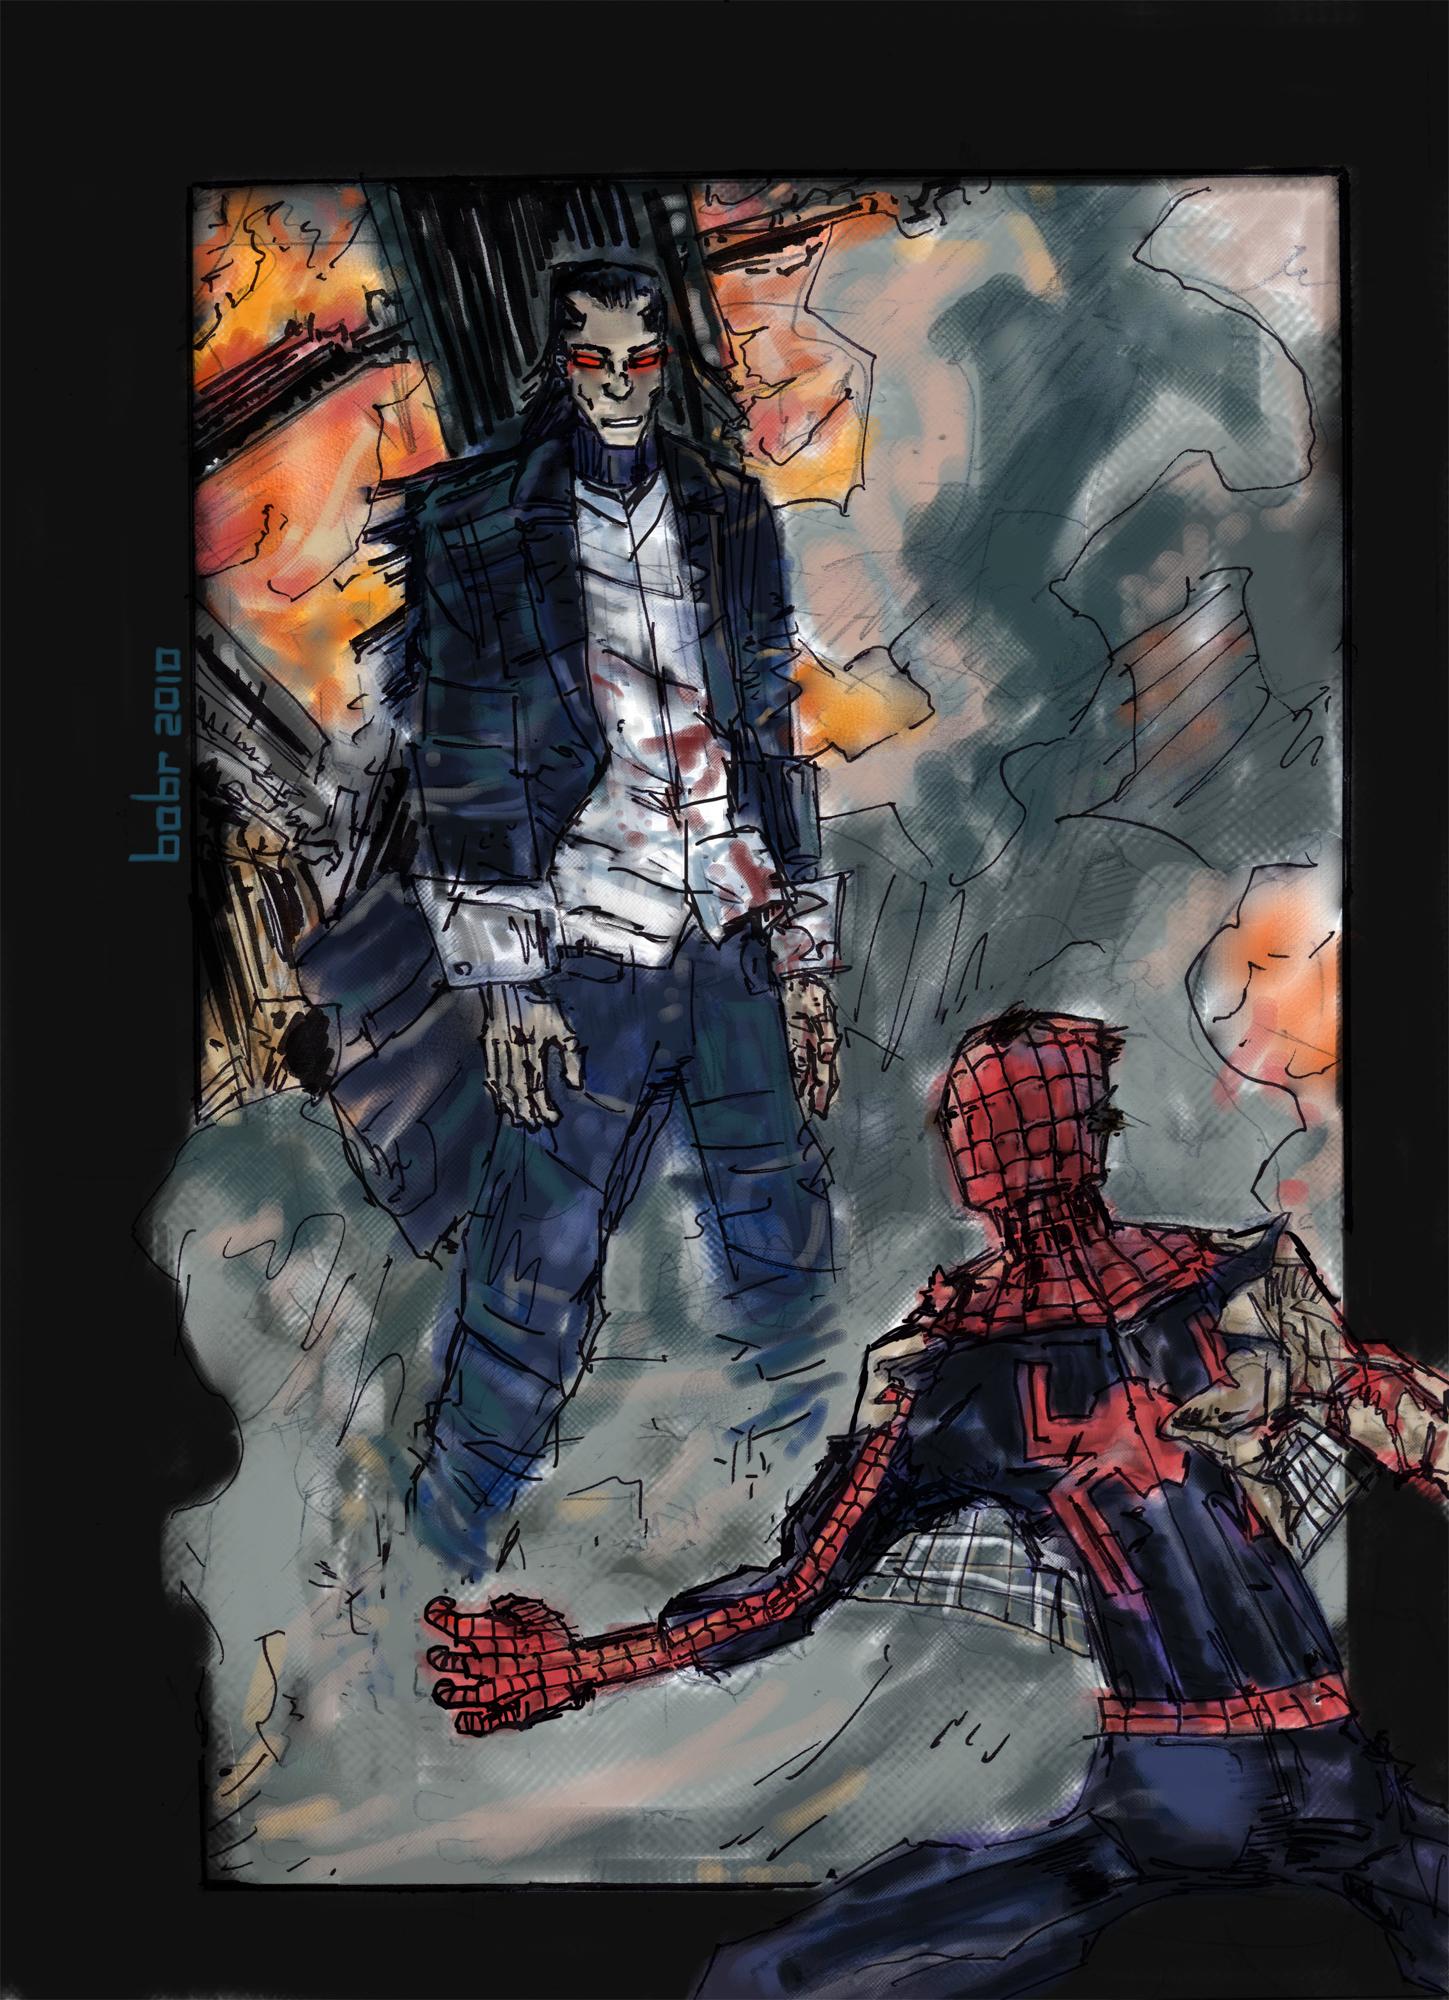 Morlun spiderman - photo#24